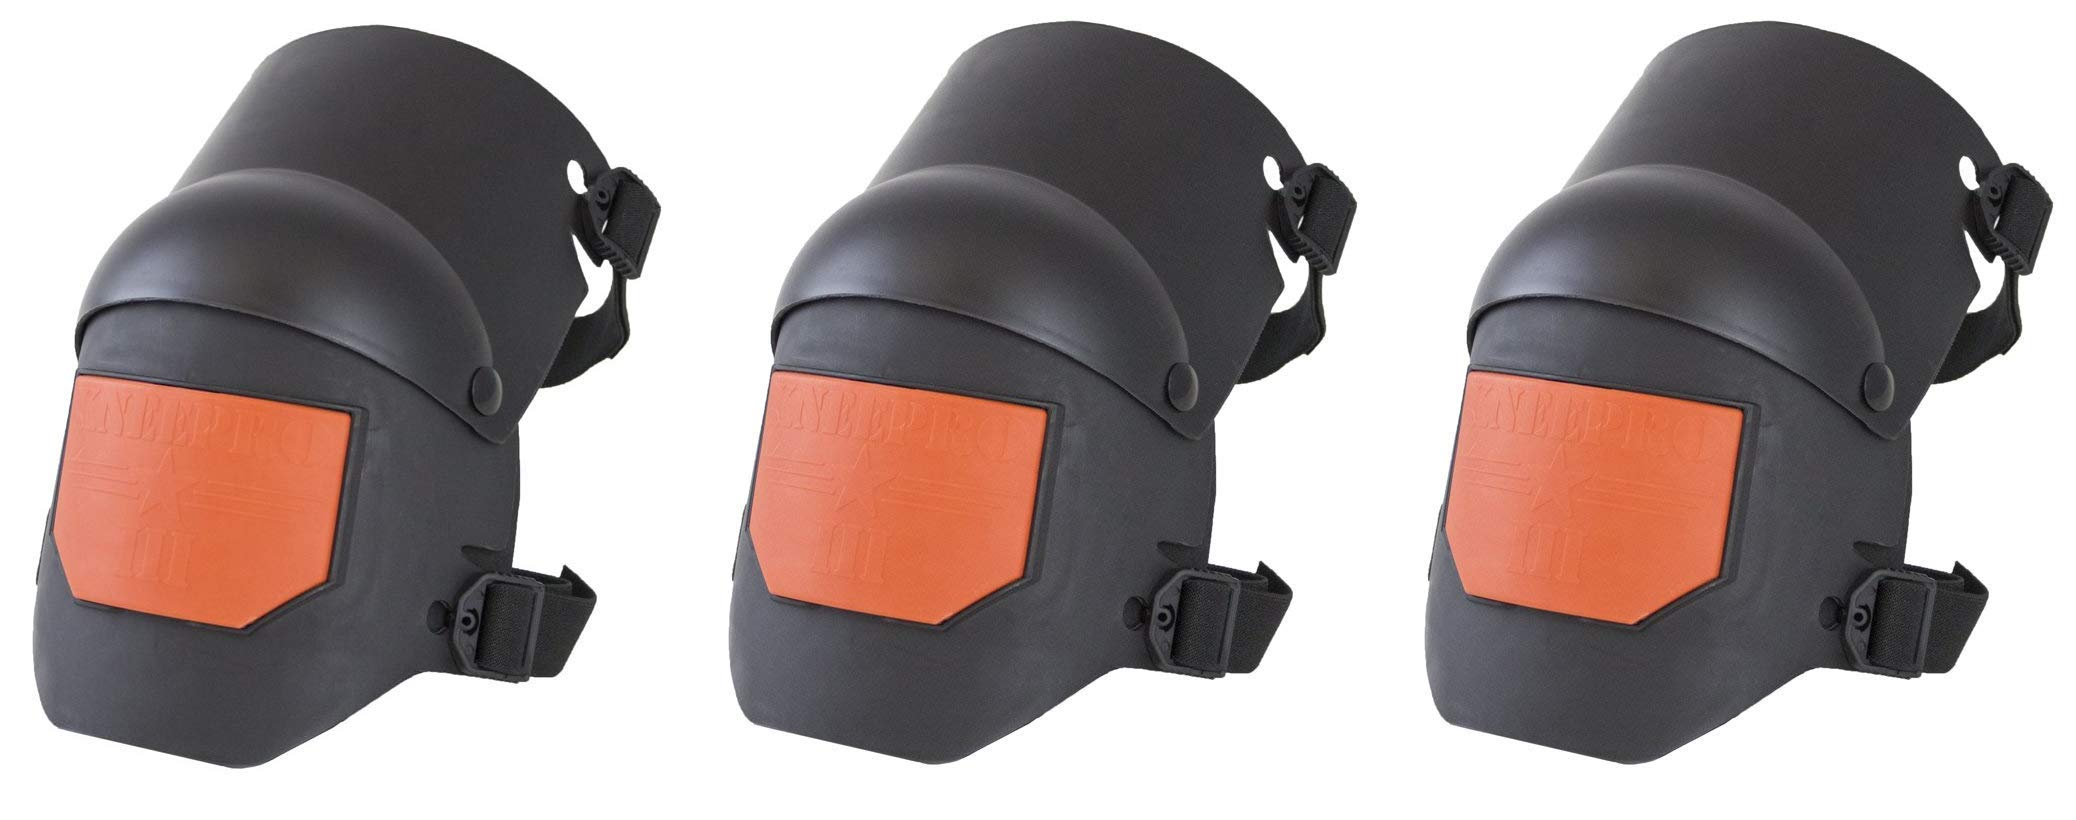 Sellstrom S96211 Knee Pro Hybrid Ultra Flex III Knee Pad Gel Universal, Black/Orange (Тhrее Pаck)